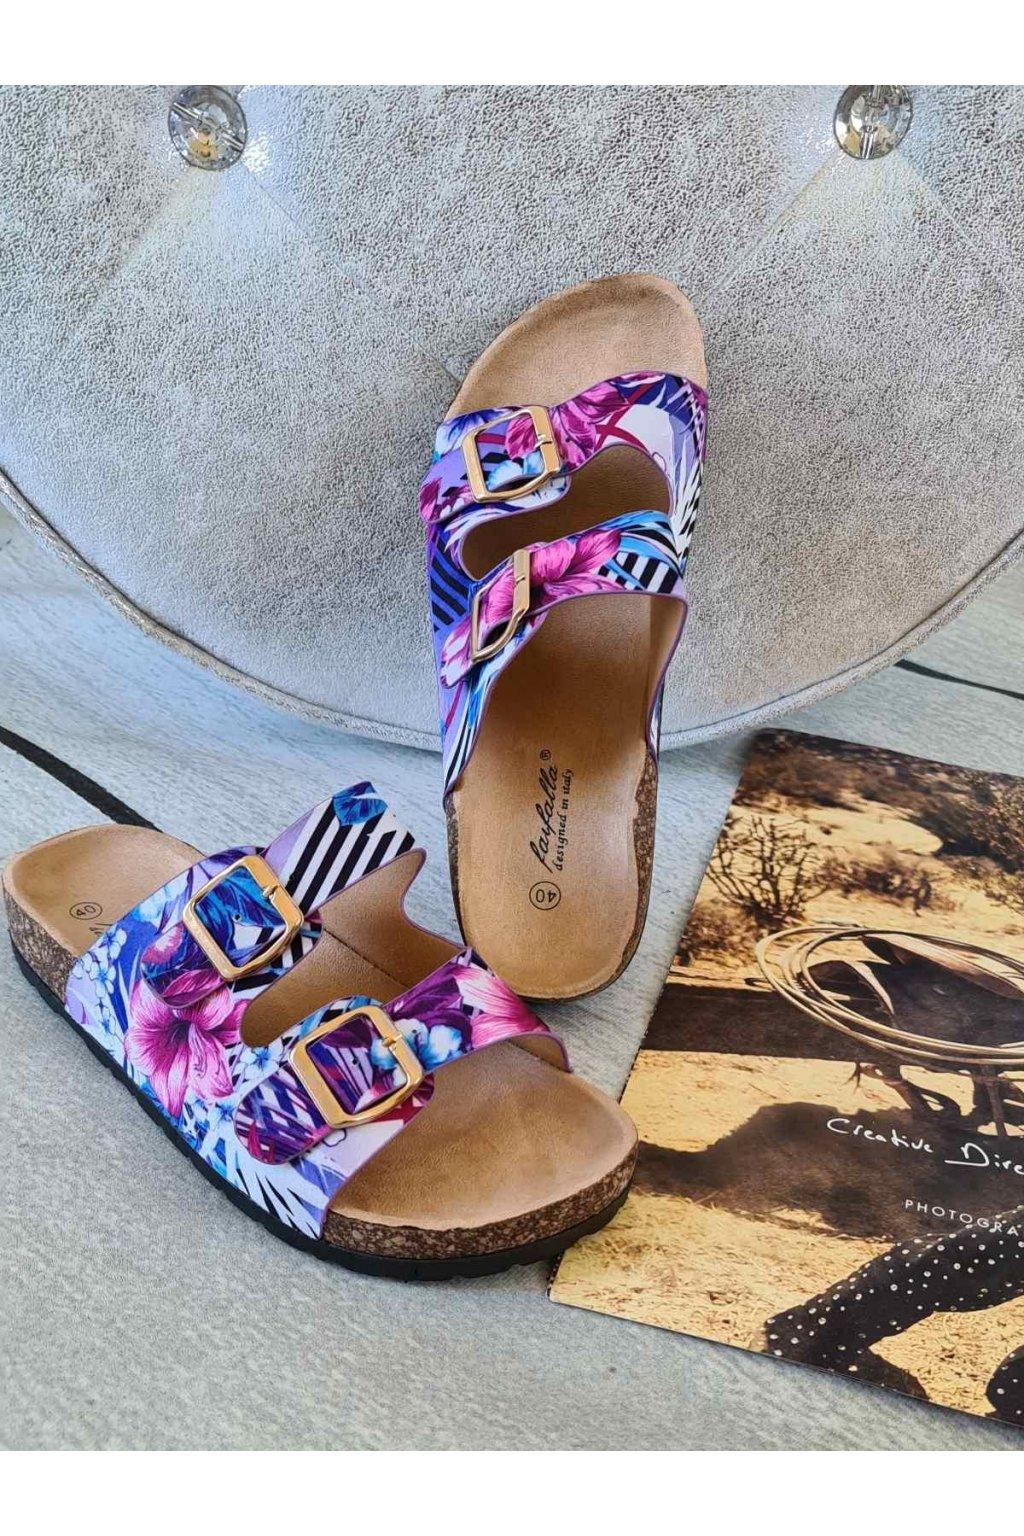 gloria pantofle korkáče fialové